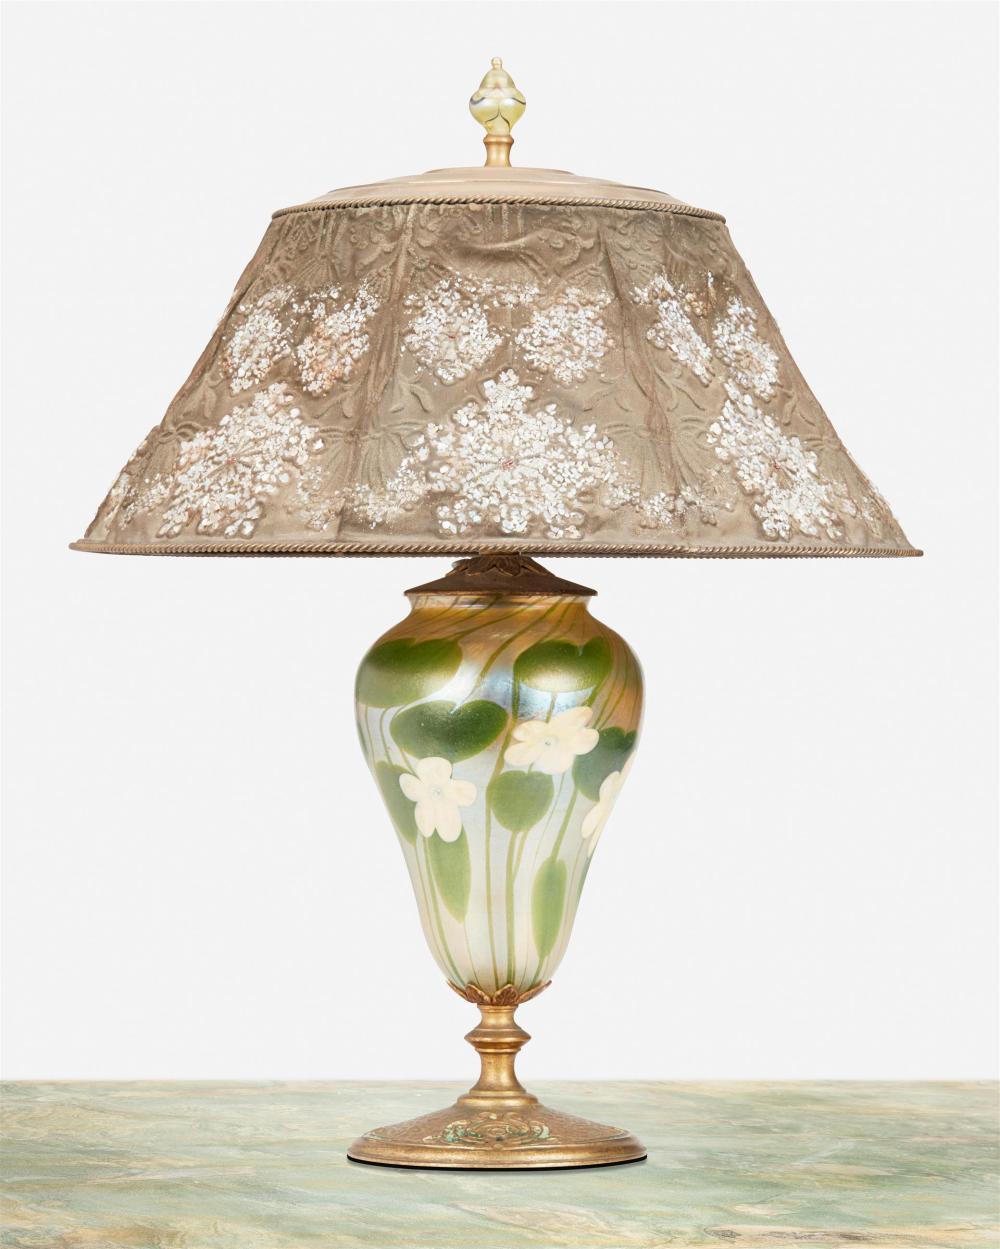 A Tiffany Studios Favrile glass table lamp